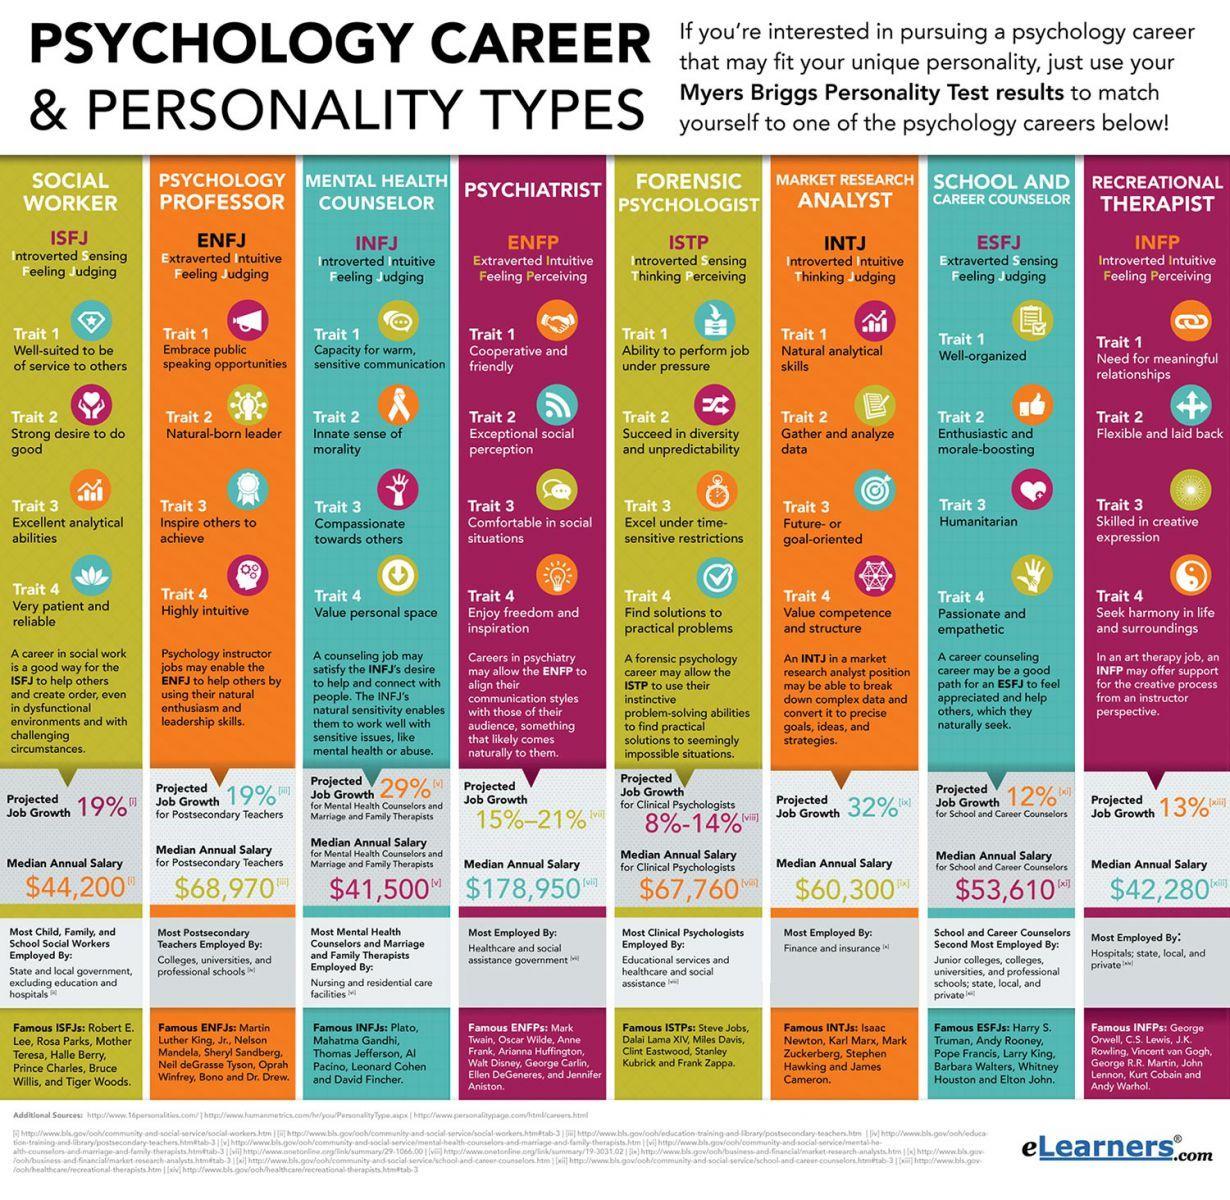 Psychology Career Personality Types Jpg 1230 1200 Pixels Psychology Careers Funny Dating Quotes Psychology